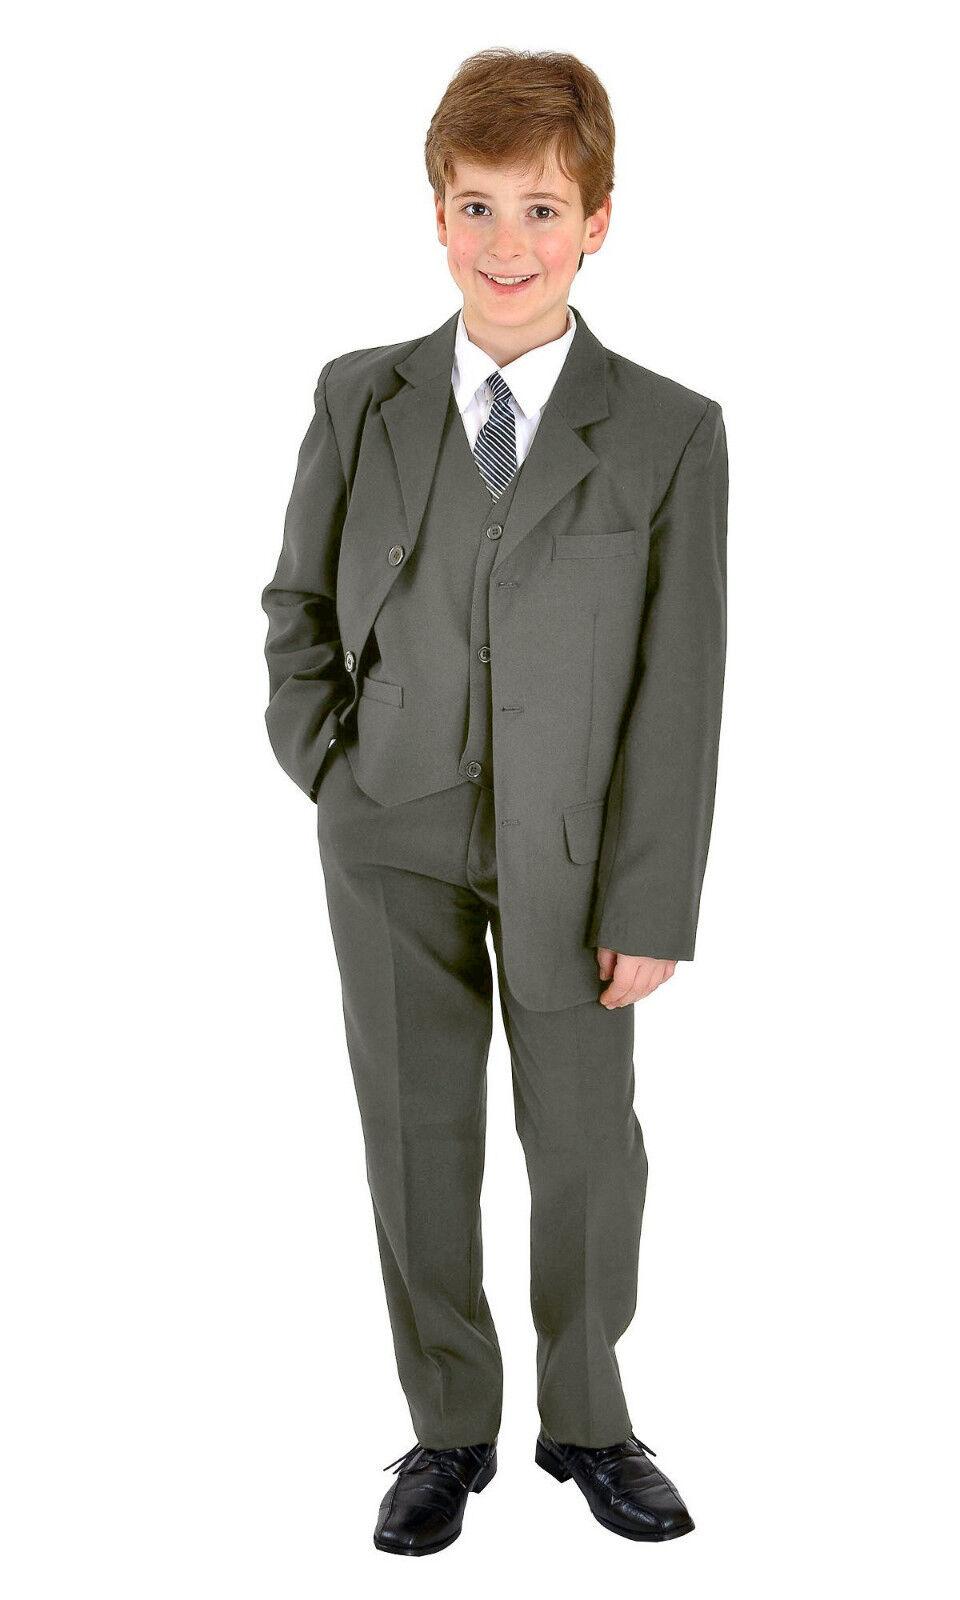 5 teiliger Jungenanzug Kinderanzug Kommunionsanzug Anzug festlich uni dunkelgrau